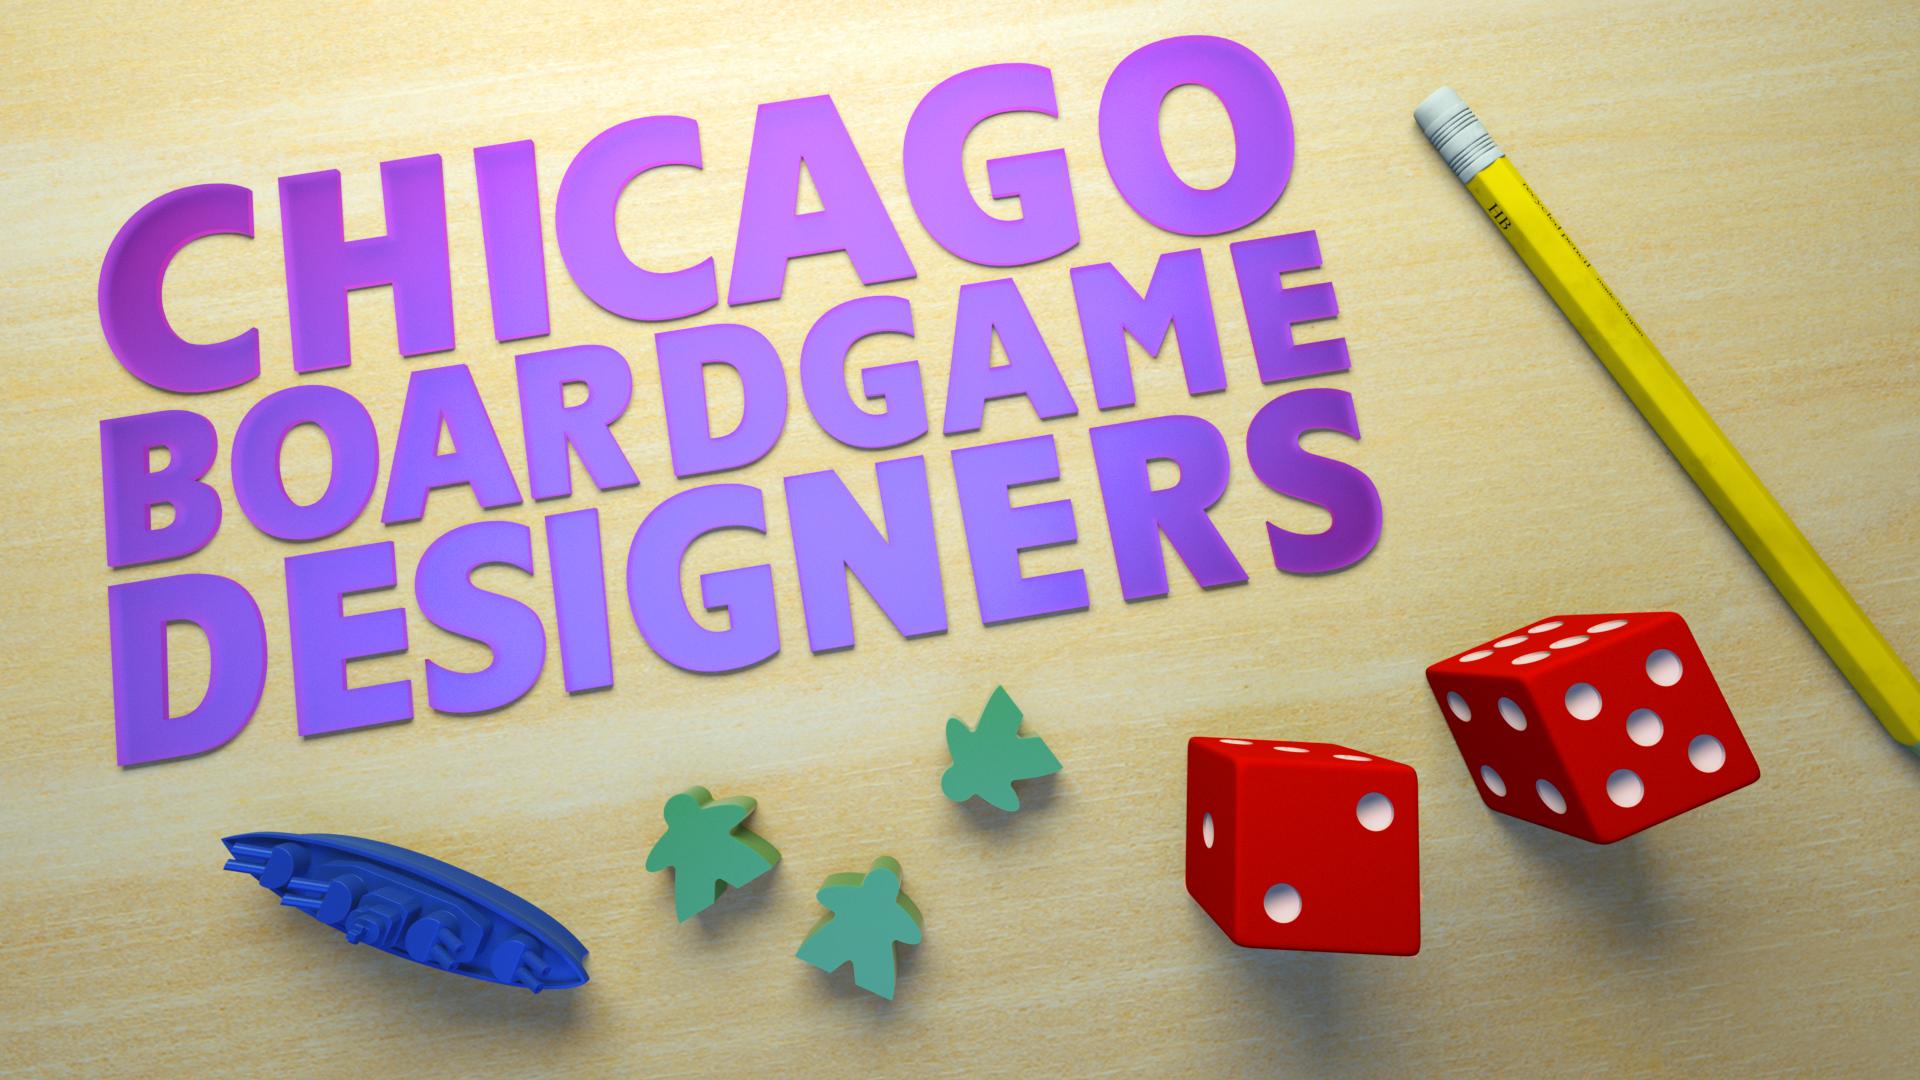 Chicago Boardgame Designers